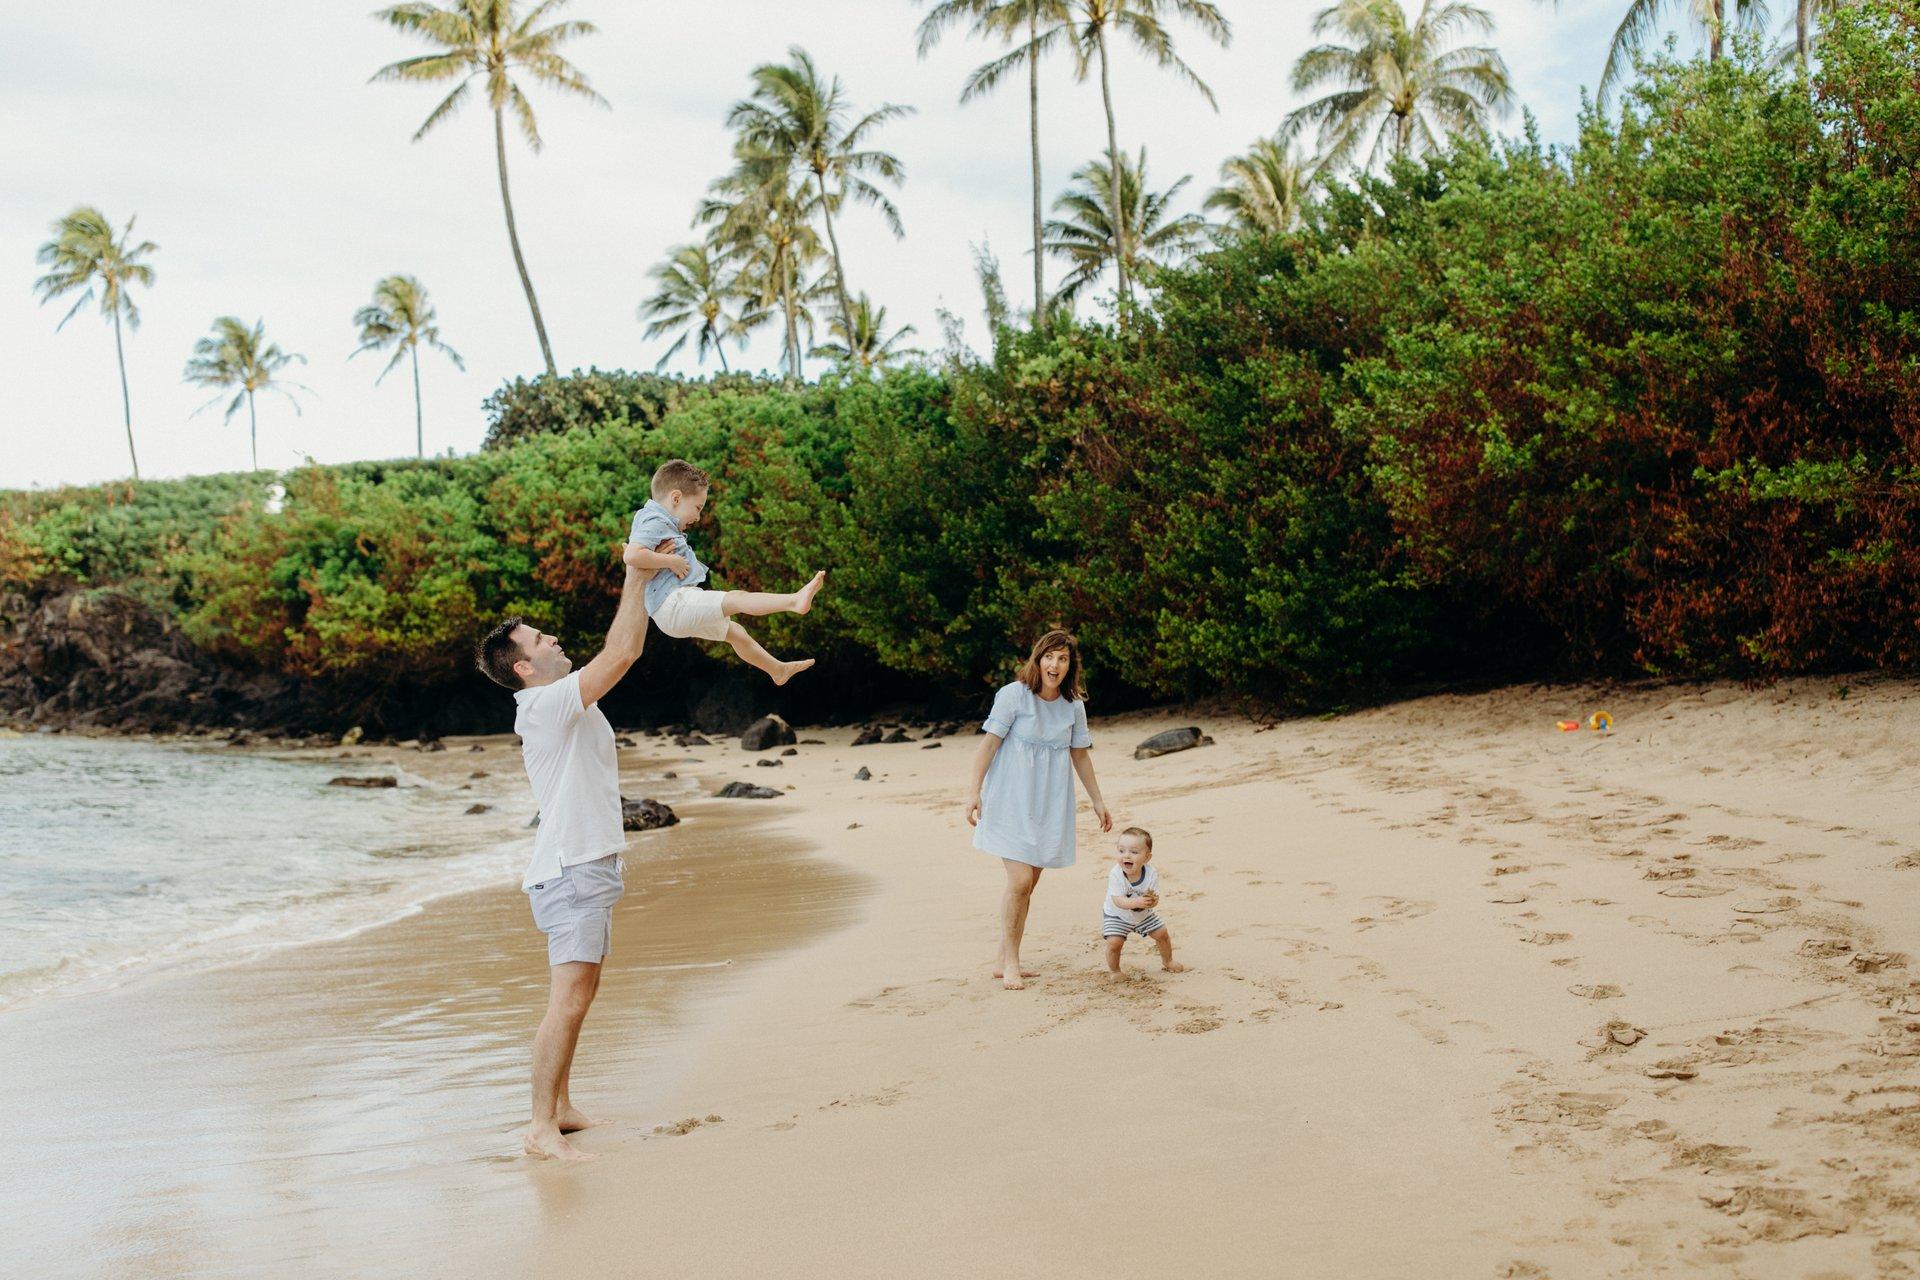 Maui-USA-travel-story-Flytographer-12